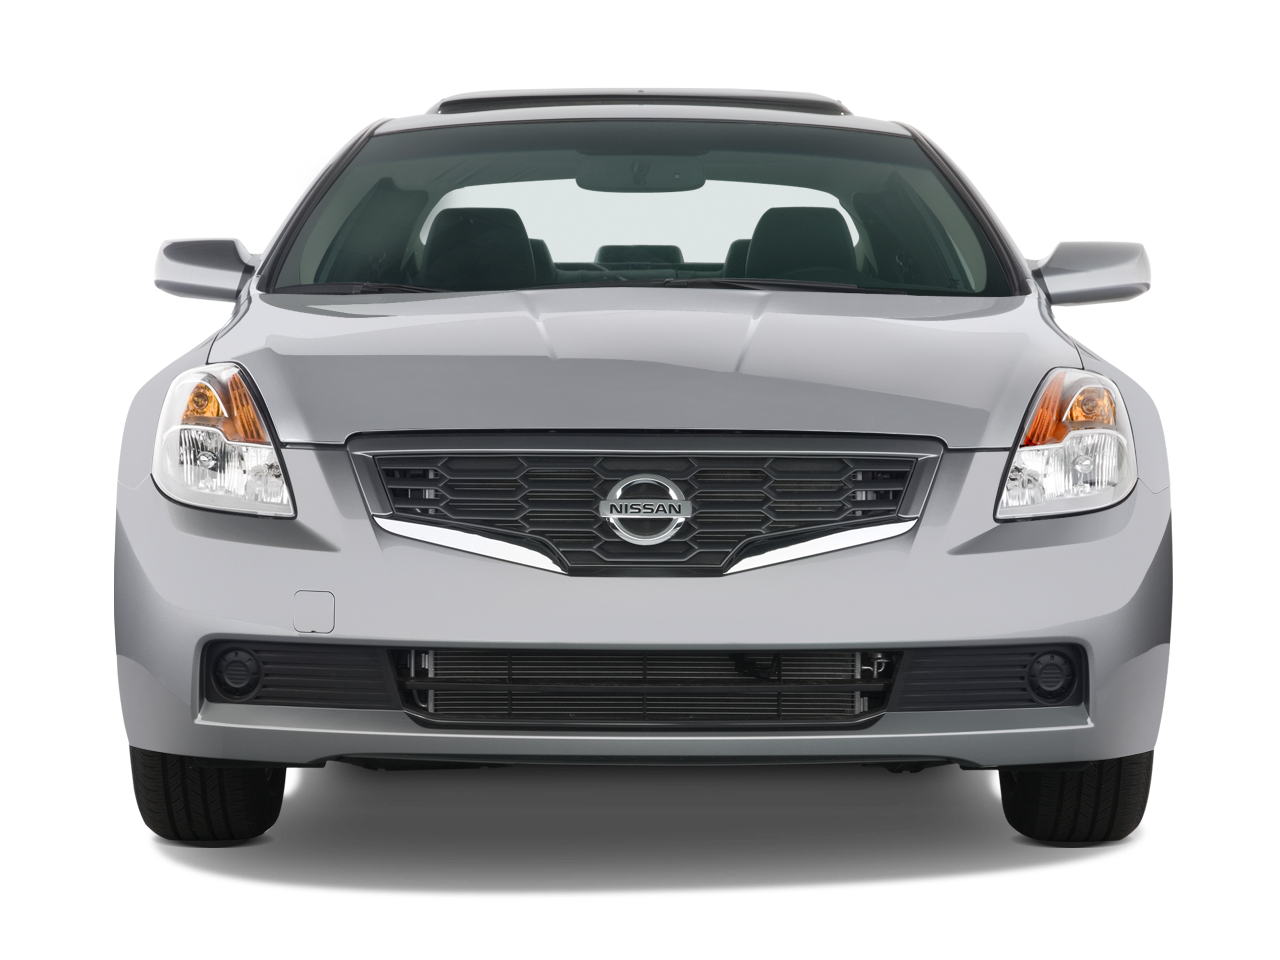 2009 Nissan Altima Hybrid - Nissan Hybrid Sedan Review ...  2009